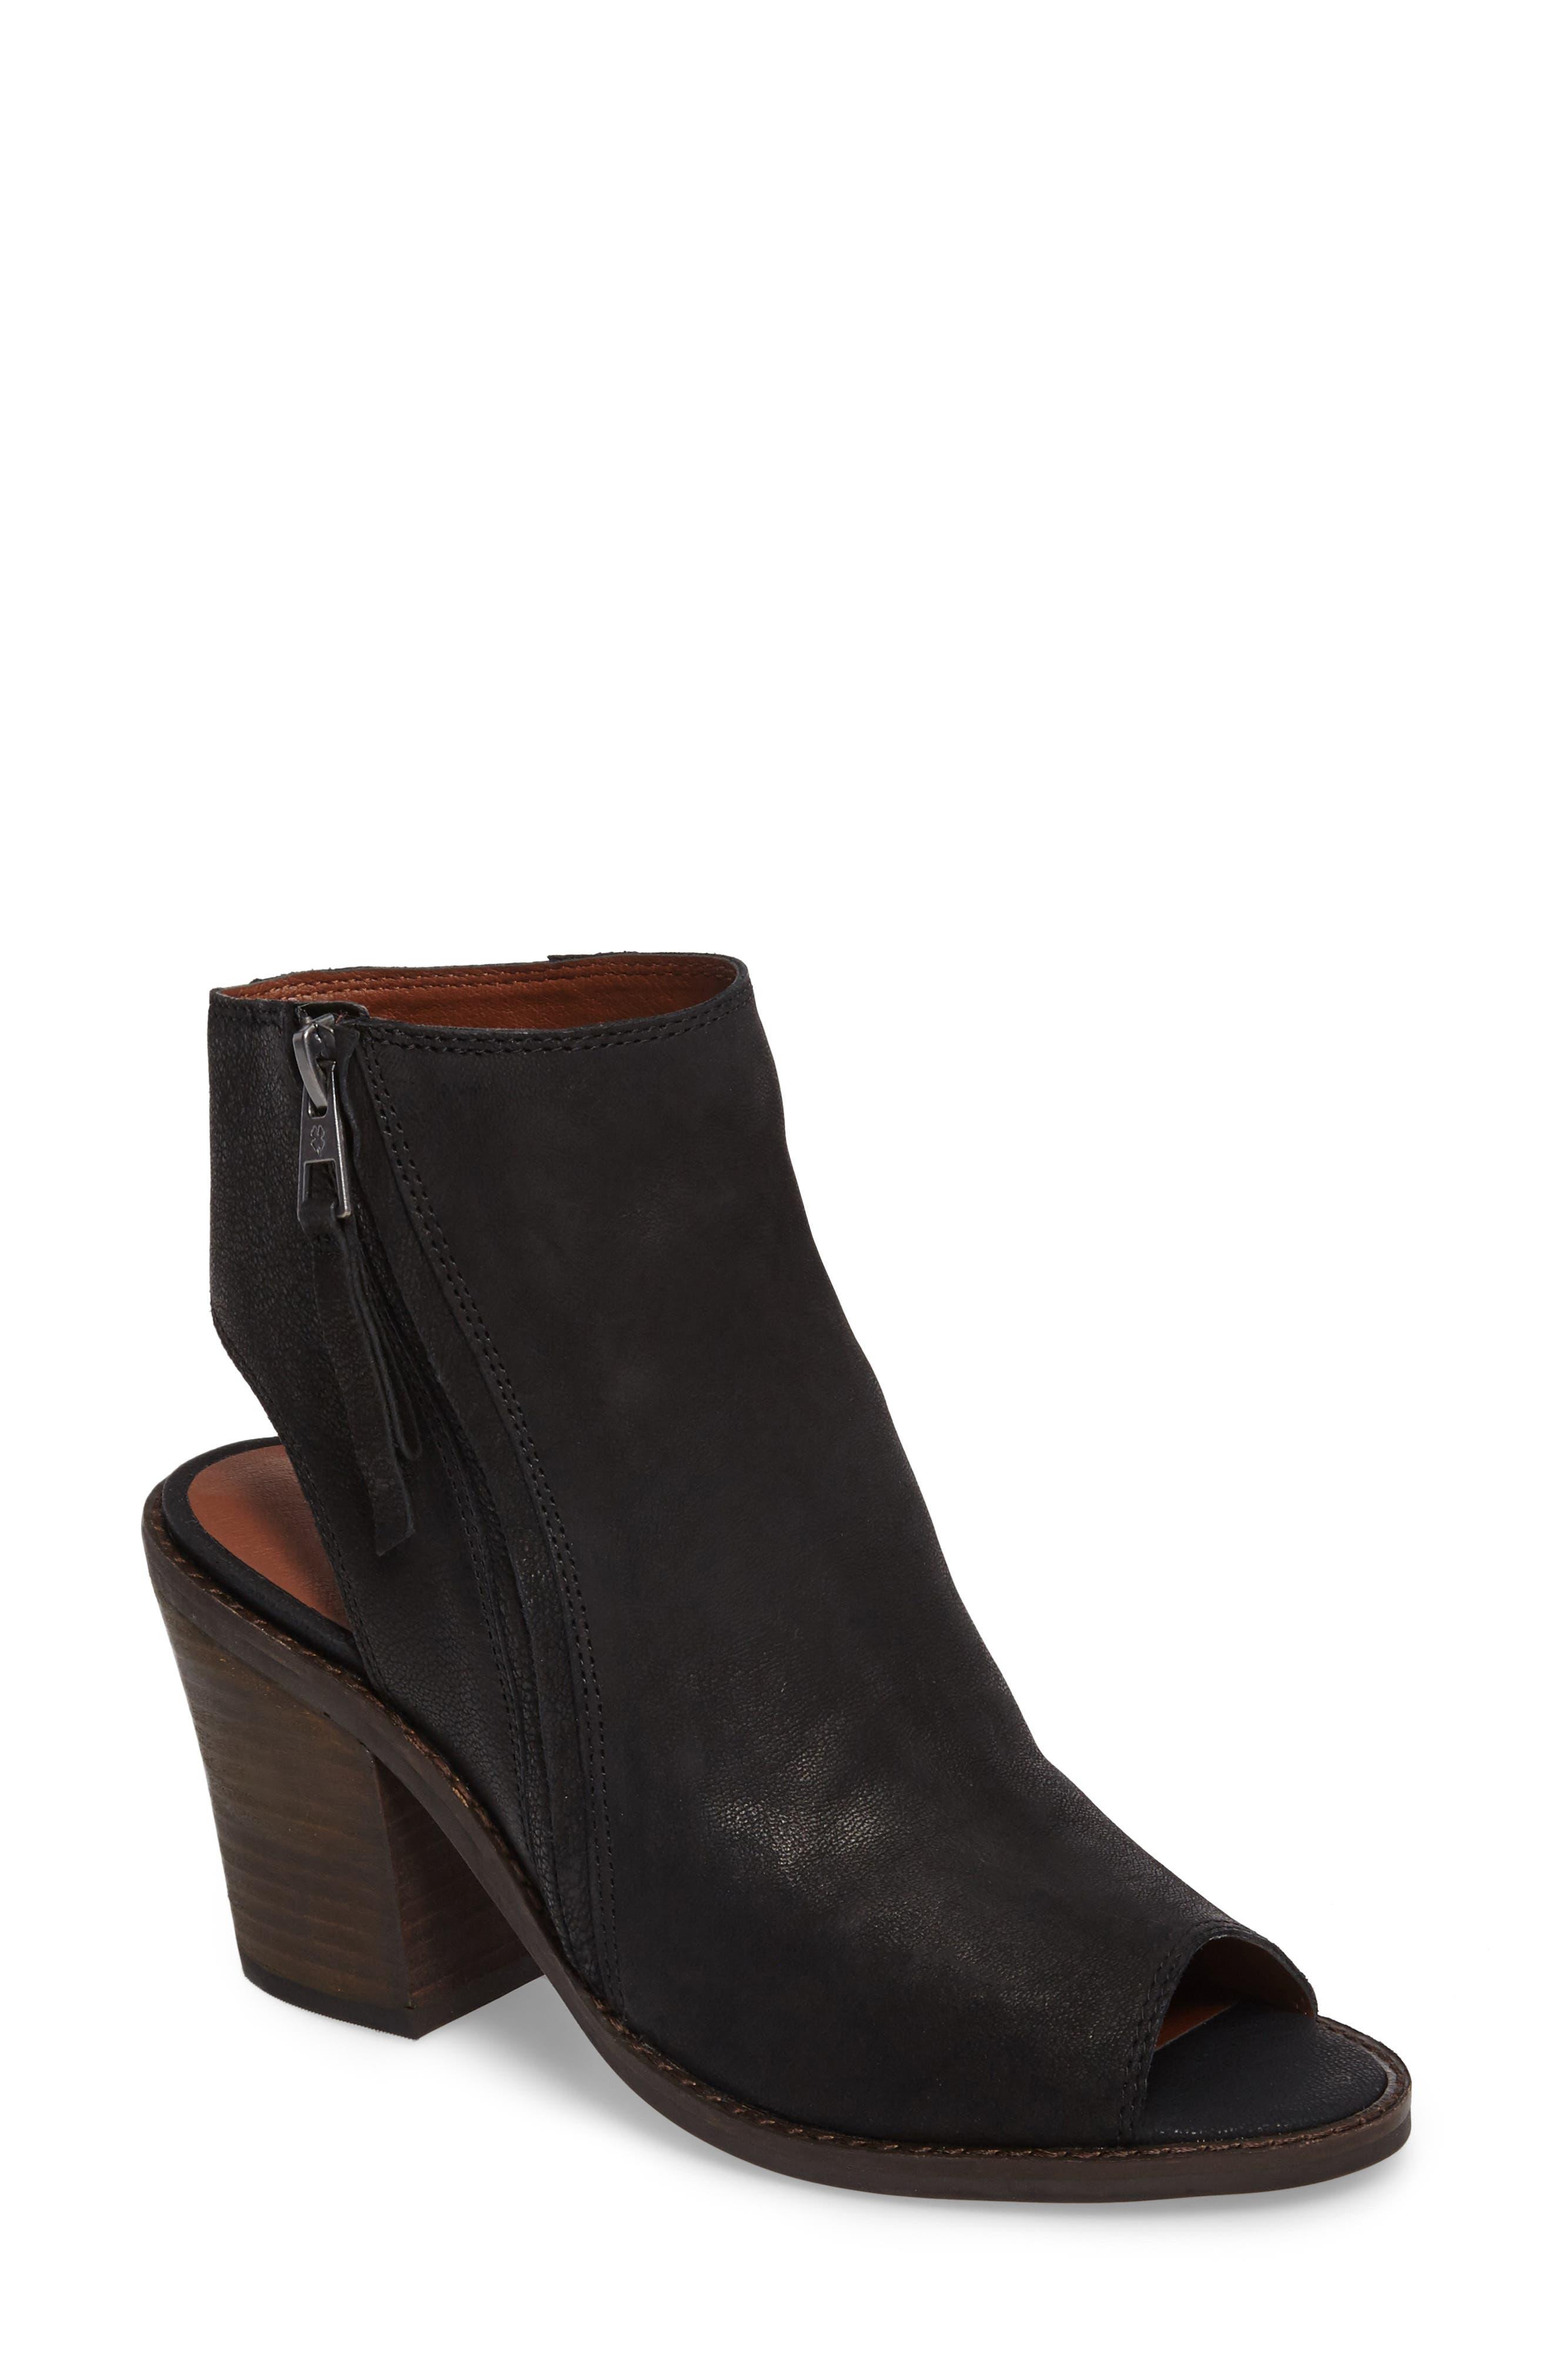 Terrie Peep Toe Bootie,                             Main thumbnail 1, color,                             Black Leather